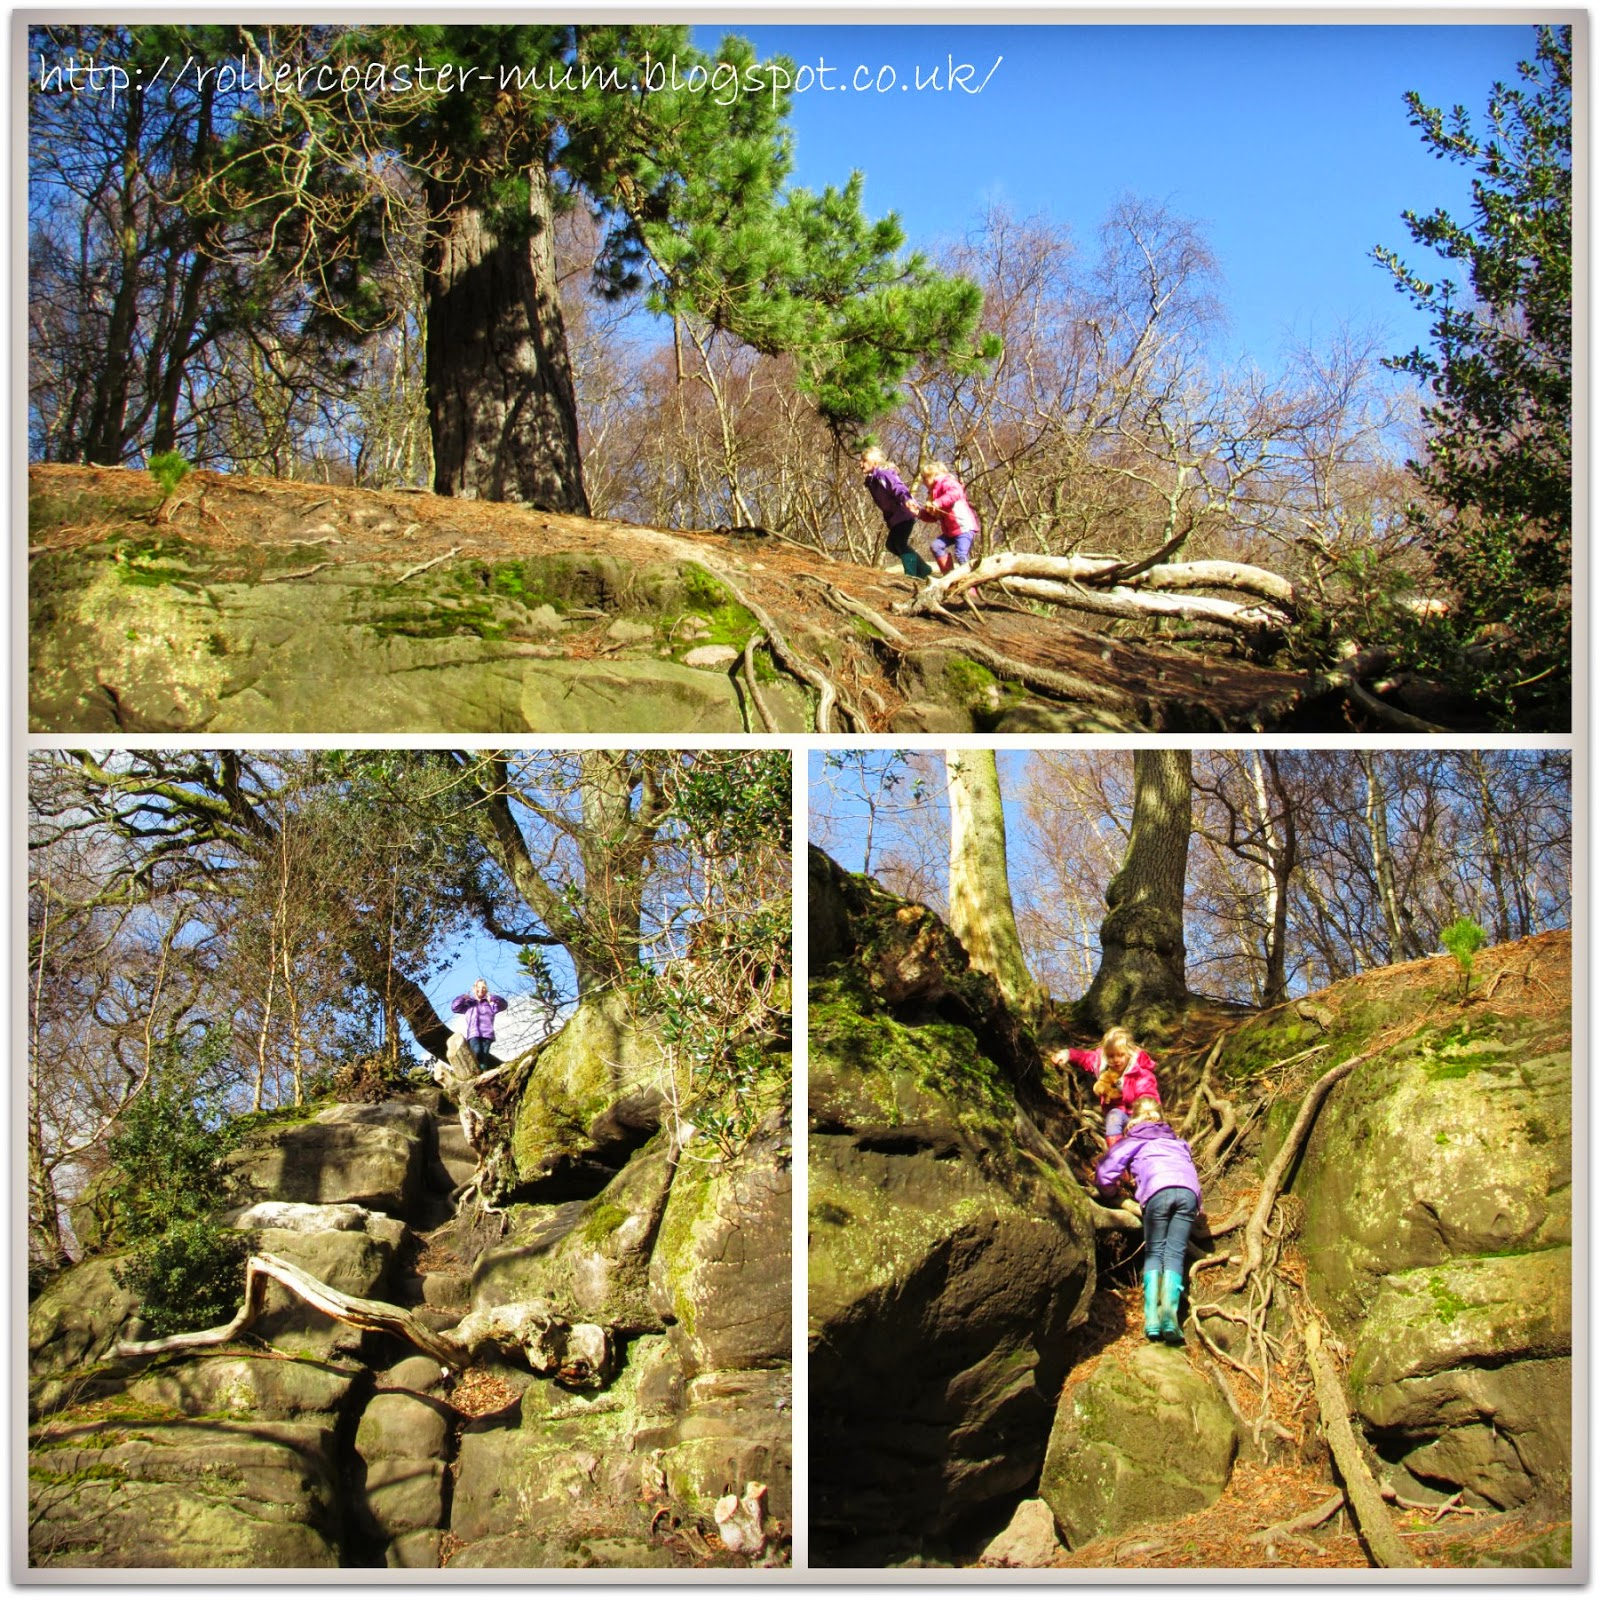 rock climbing, Woodland Trust